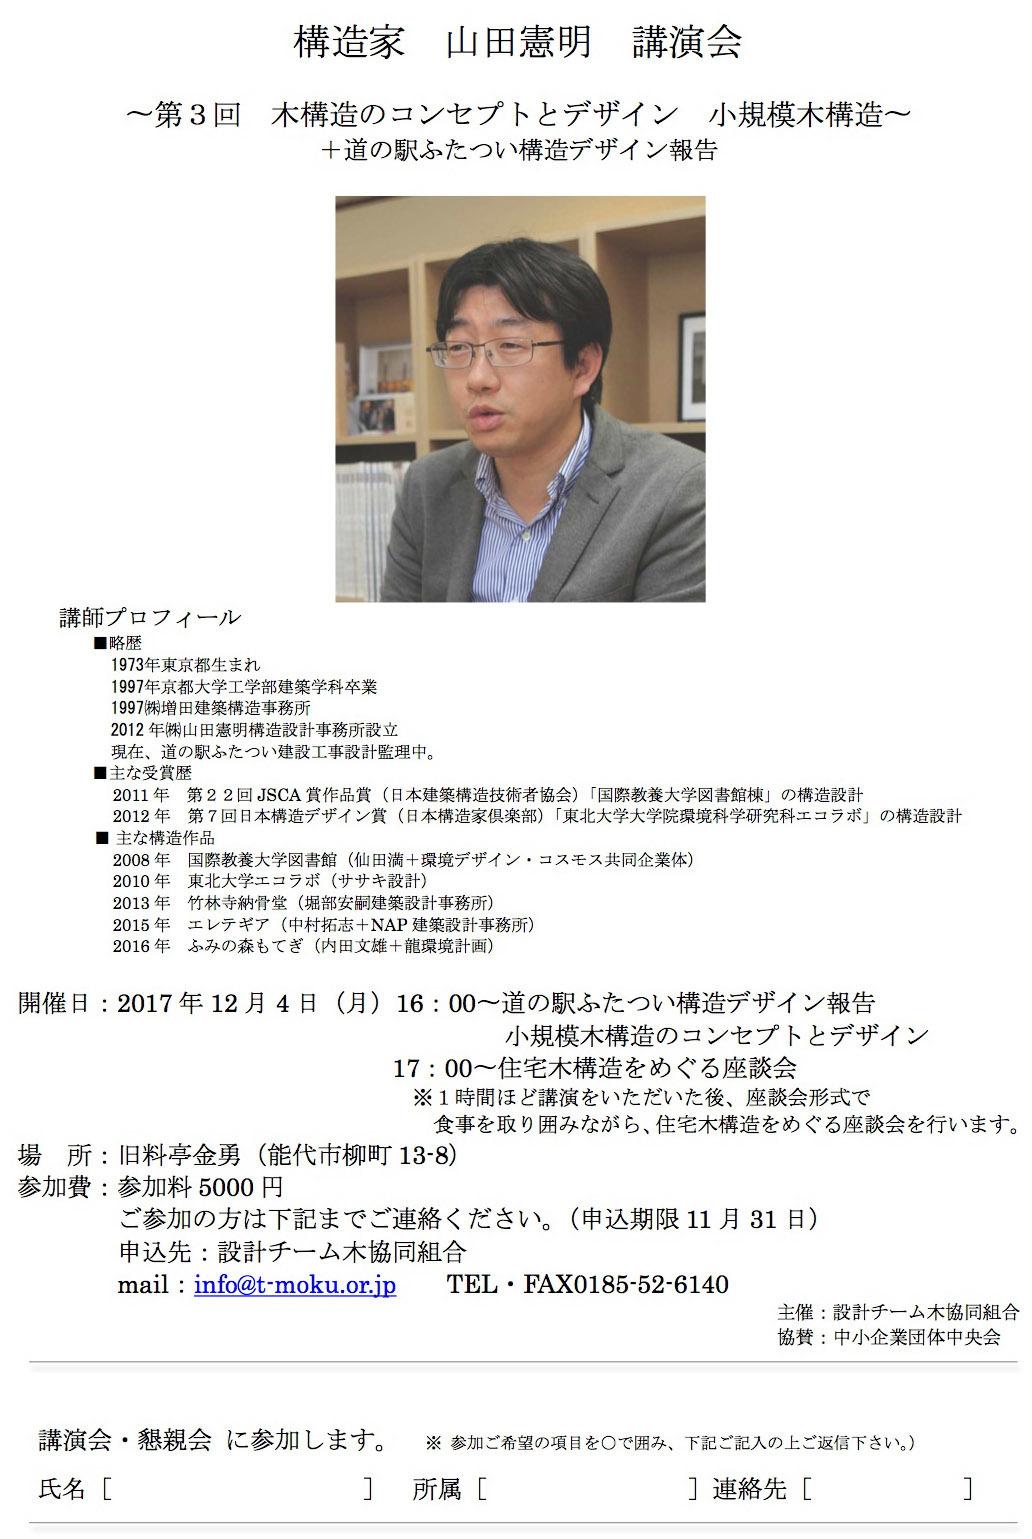 構造家 山田憲明 講演会+「住宅木構造をめぐる座談会」_e0054299_09433157.jpg